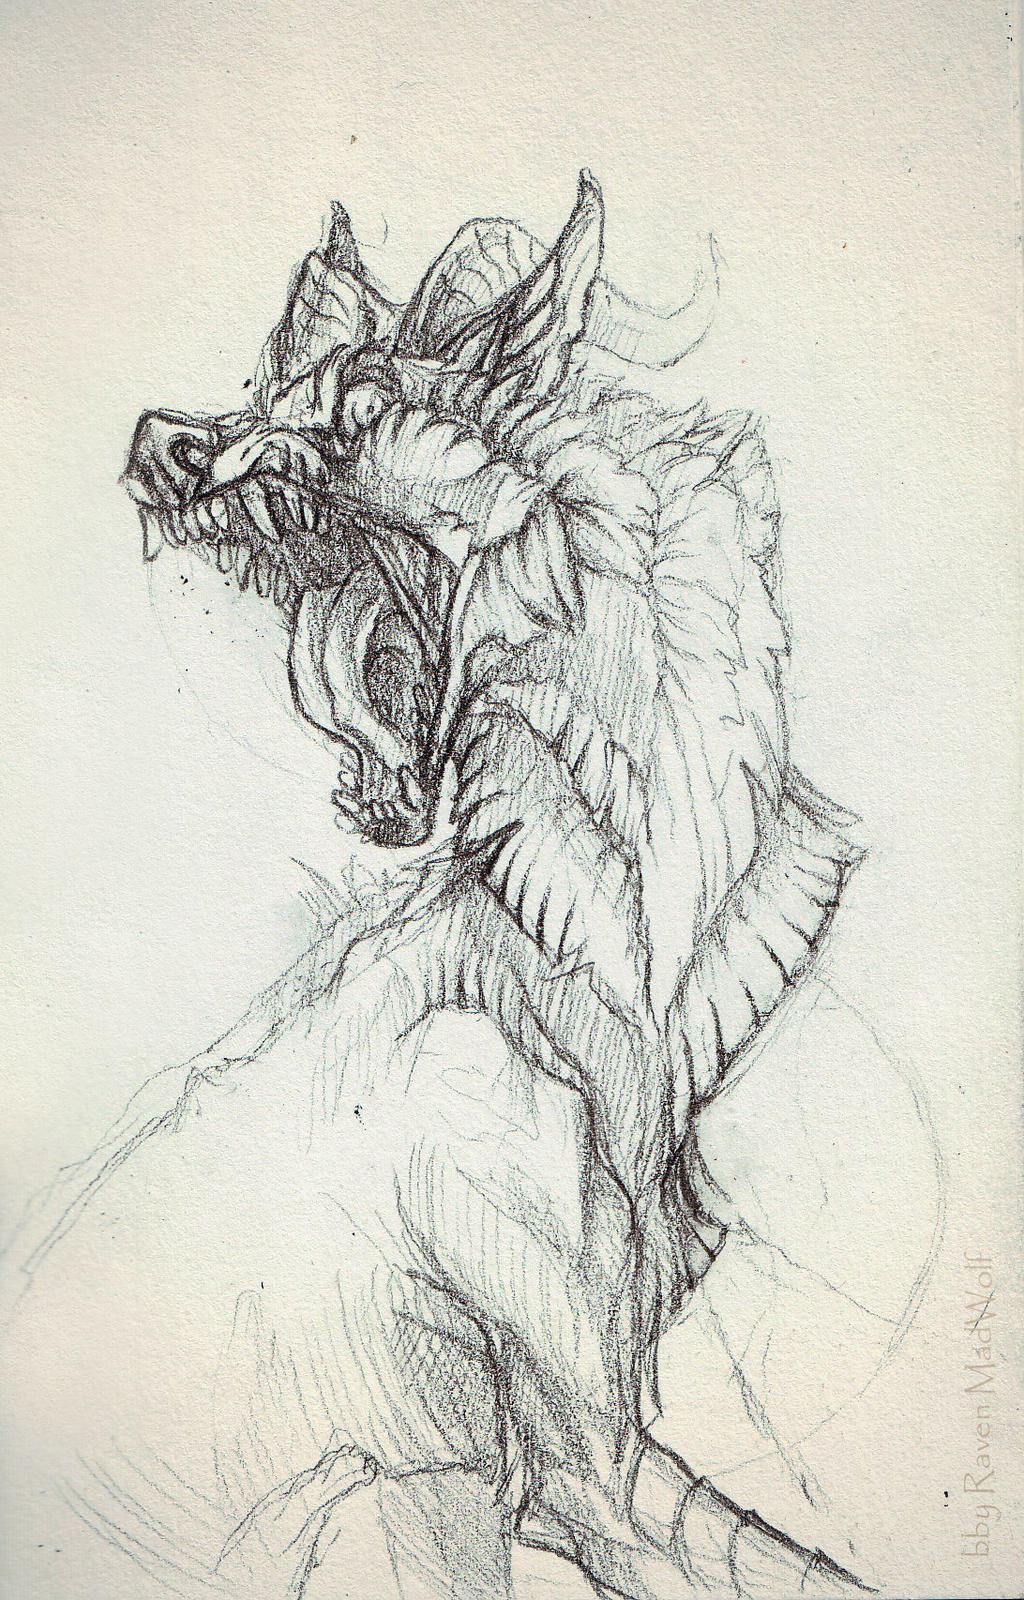 Sketch[2] by RavenMadwolf